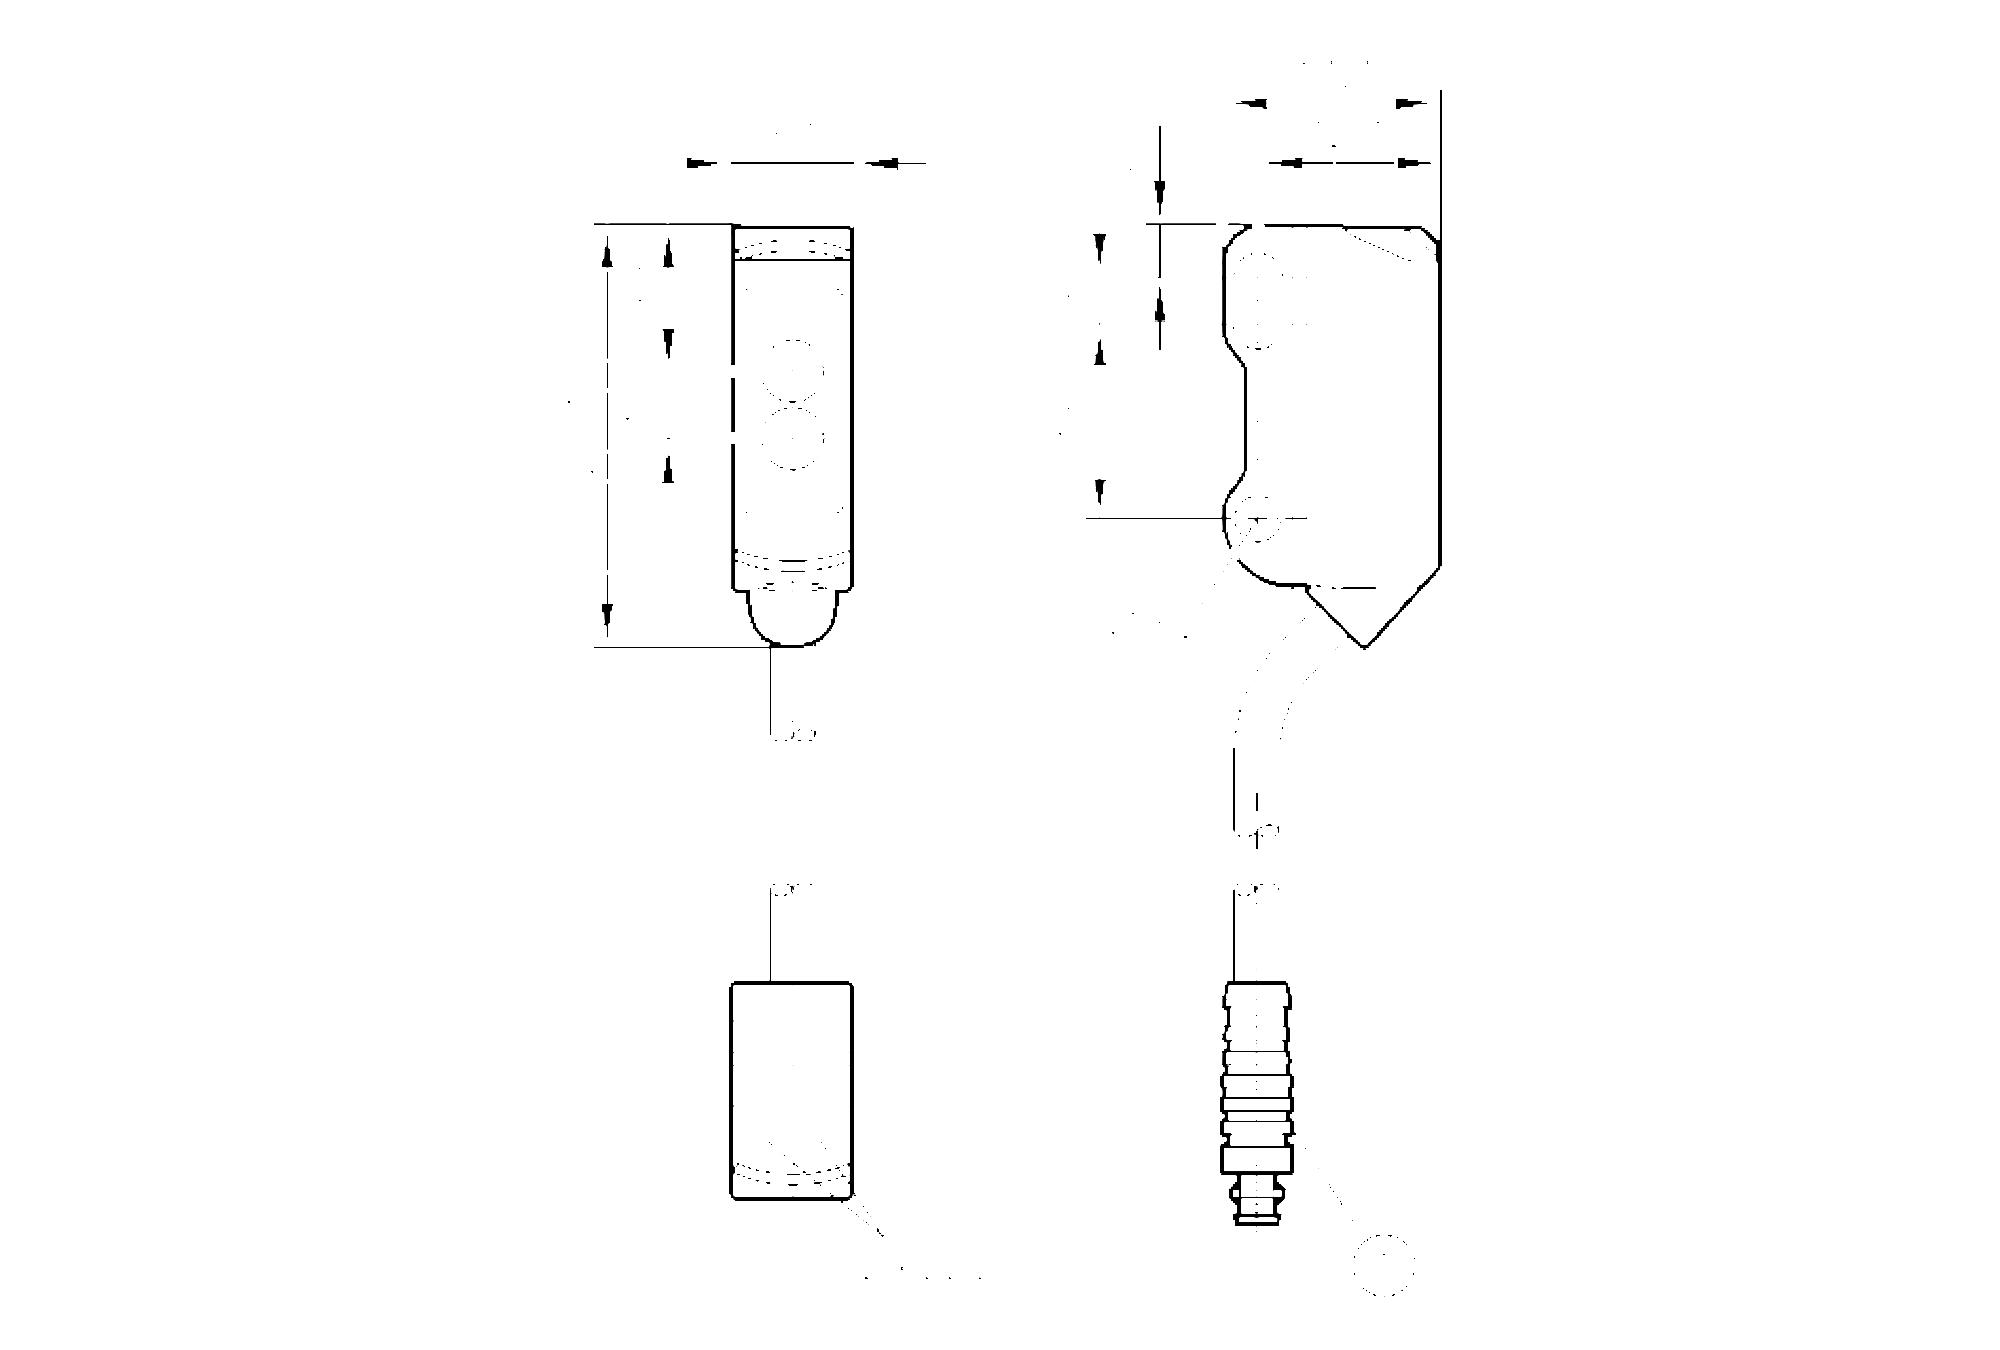 o8t205 - diffuse reflection sensor